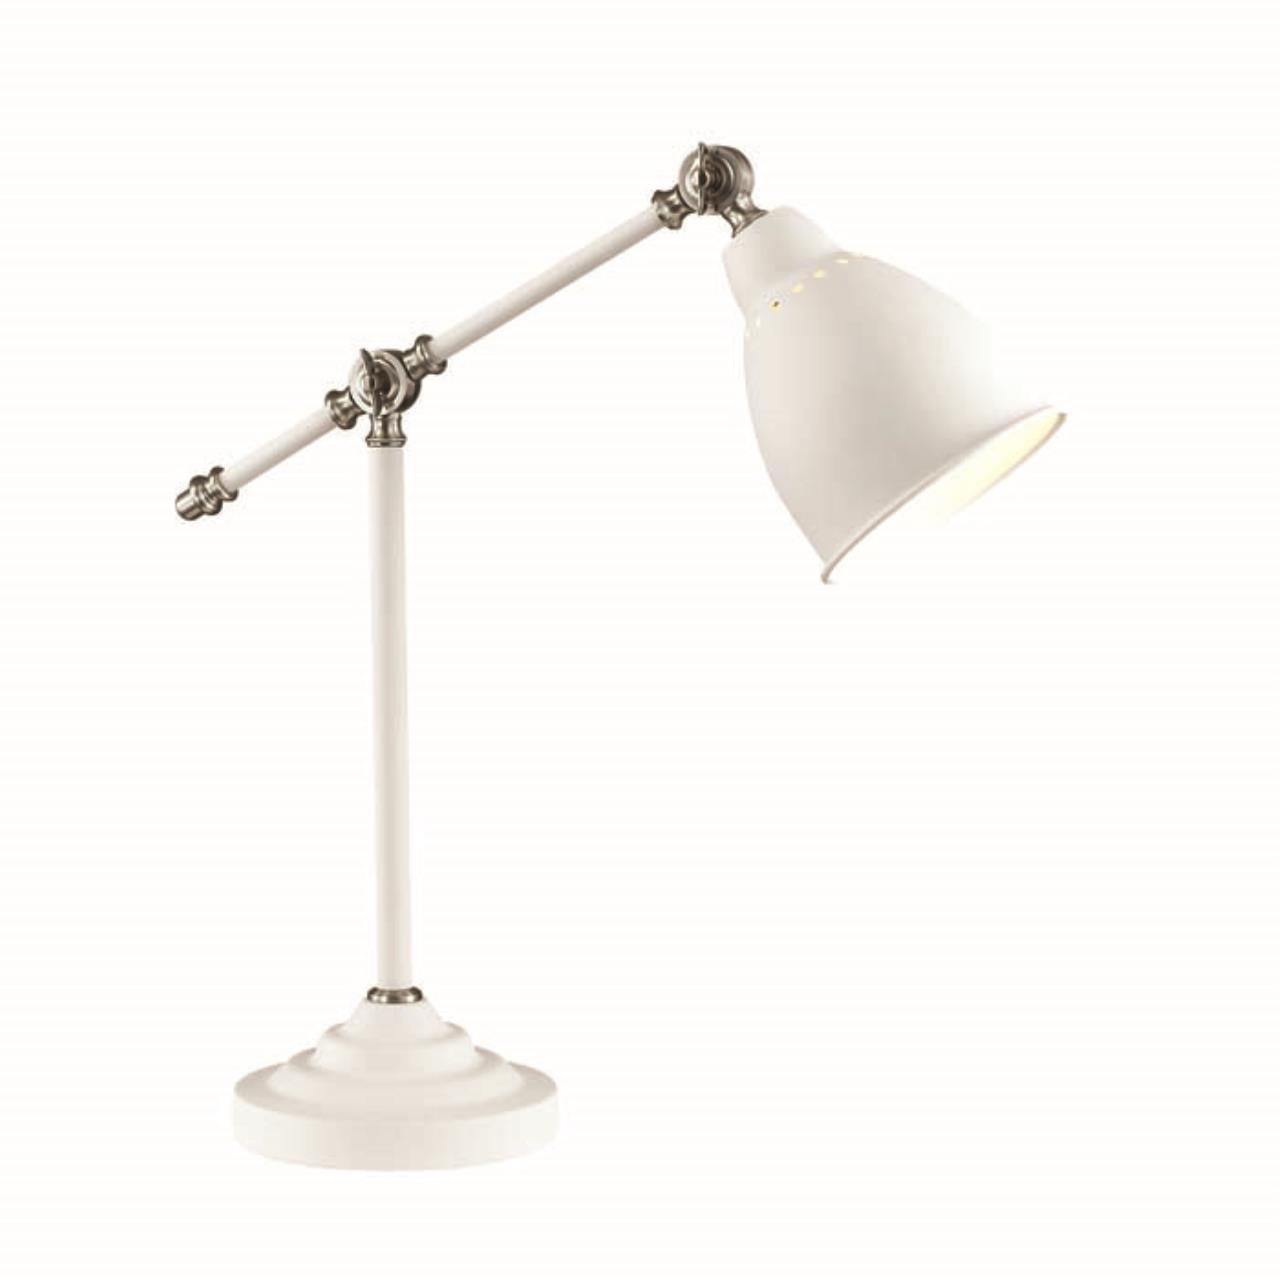 3372/1T STANDING ODL17 677 белый/никель Настольная лампа E27 60W 220V CRUZ